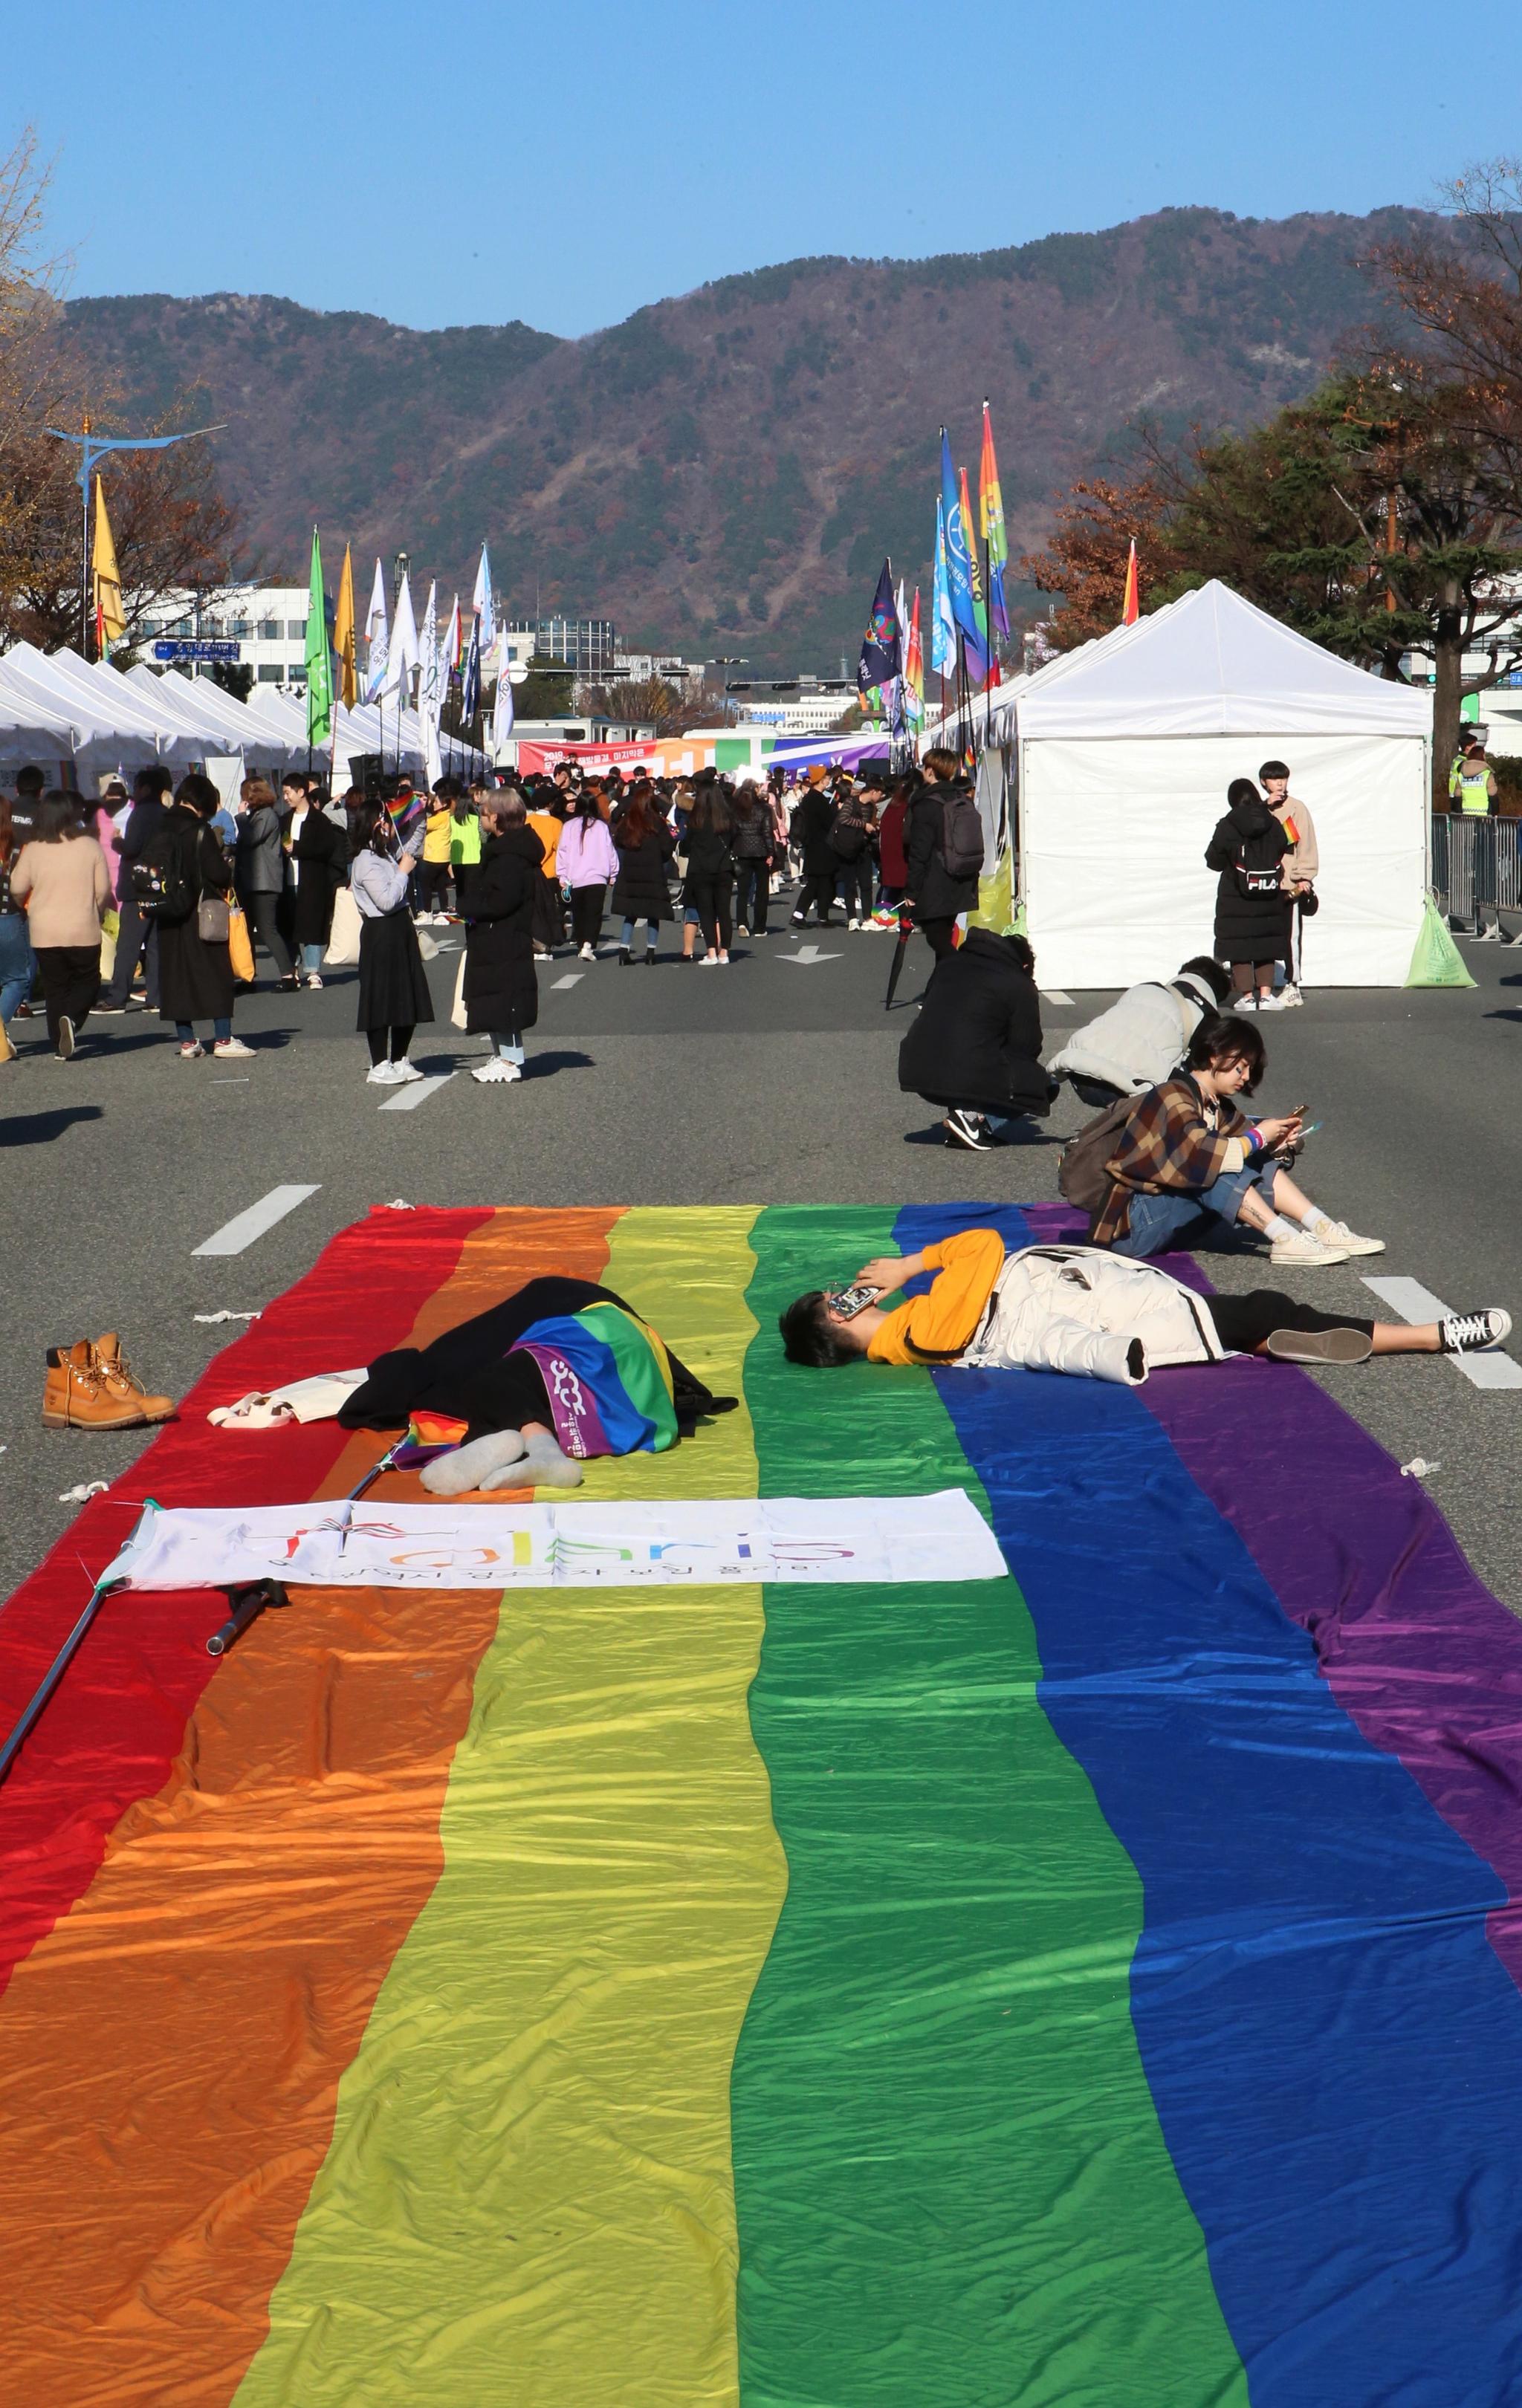 LGBT의 상징인 6개 색 중 빨간색은 삶(life)을, 오렌지색은 치유(healing)를, 노란색은 햇살(sunlight)을, 초록색은 자연(nature)을, 파란색은 조화(harmony)를, 보라색은 정신(spirit)을 상징한다. [중앙포토]